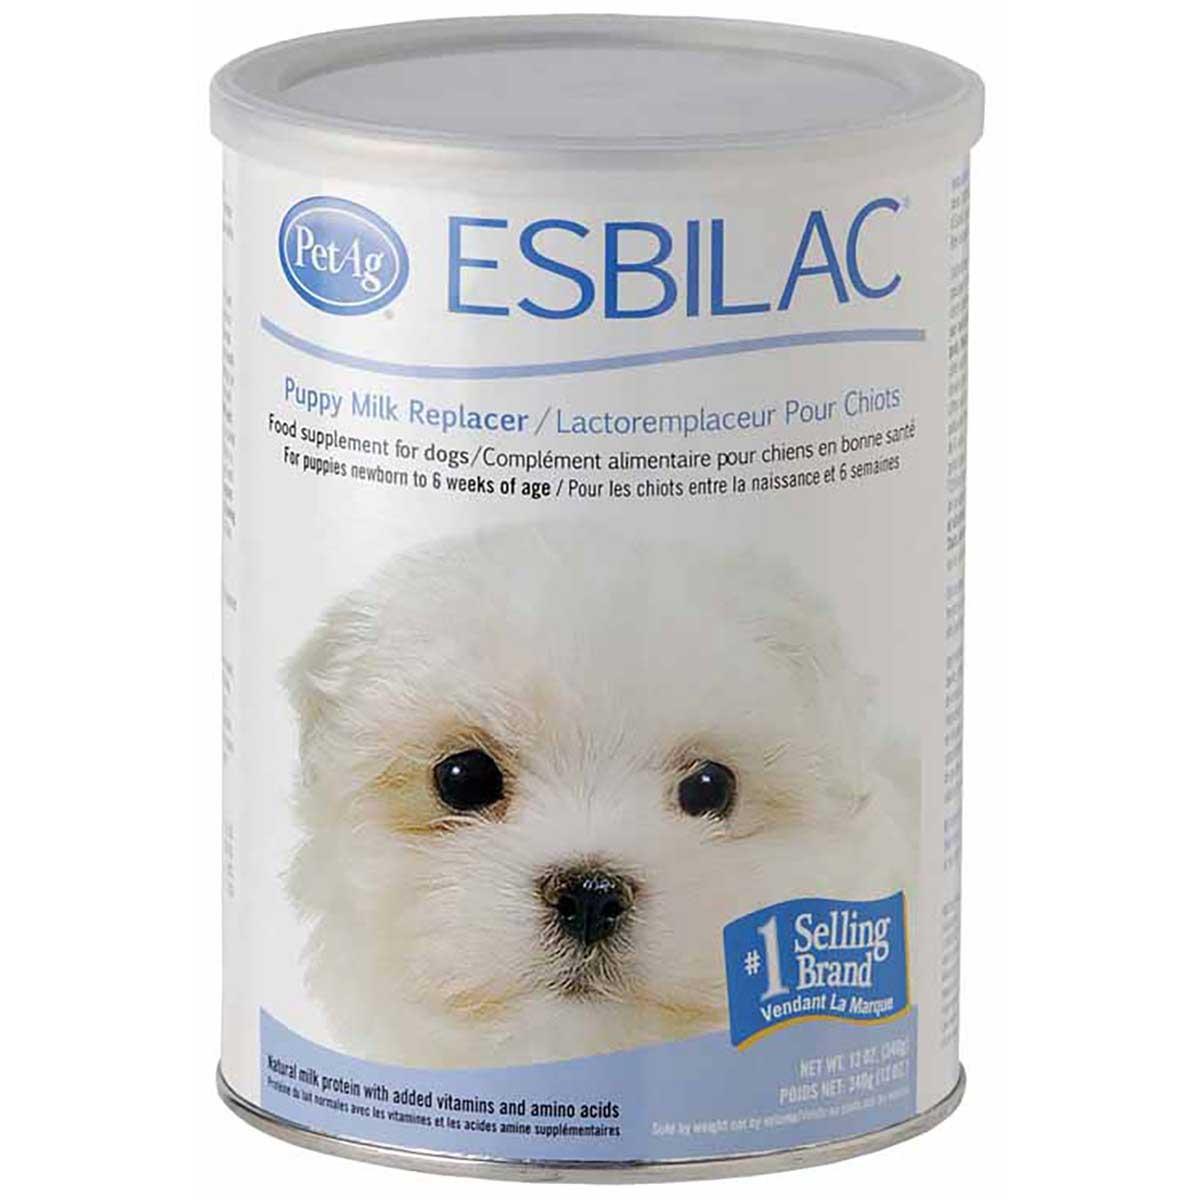 PetAg Esbilac Milk Replacement Powder for Puppies 12 oz